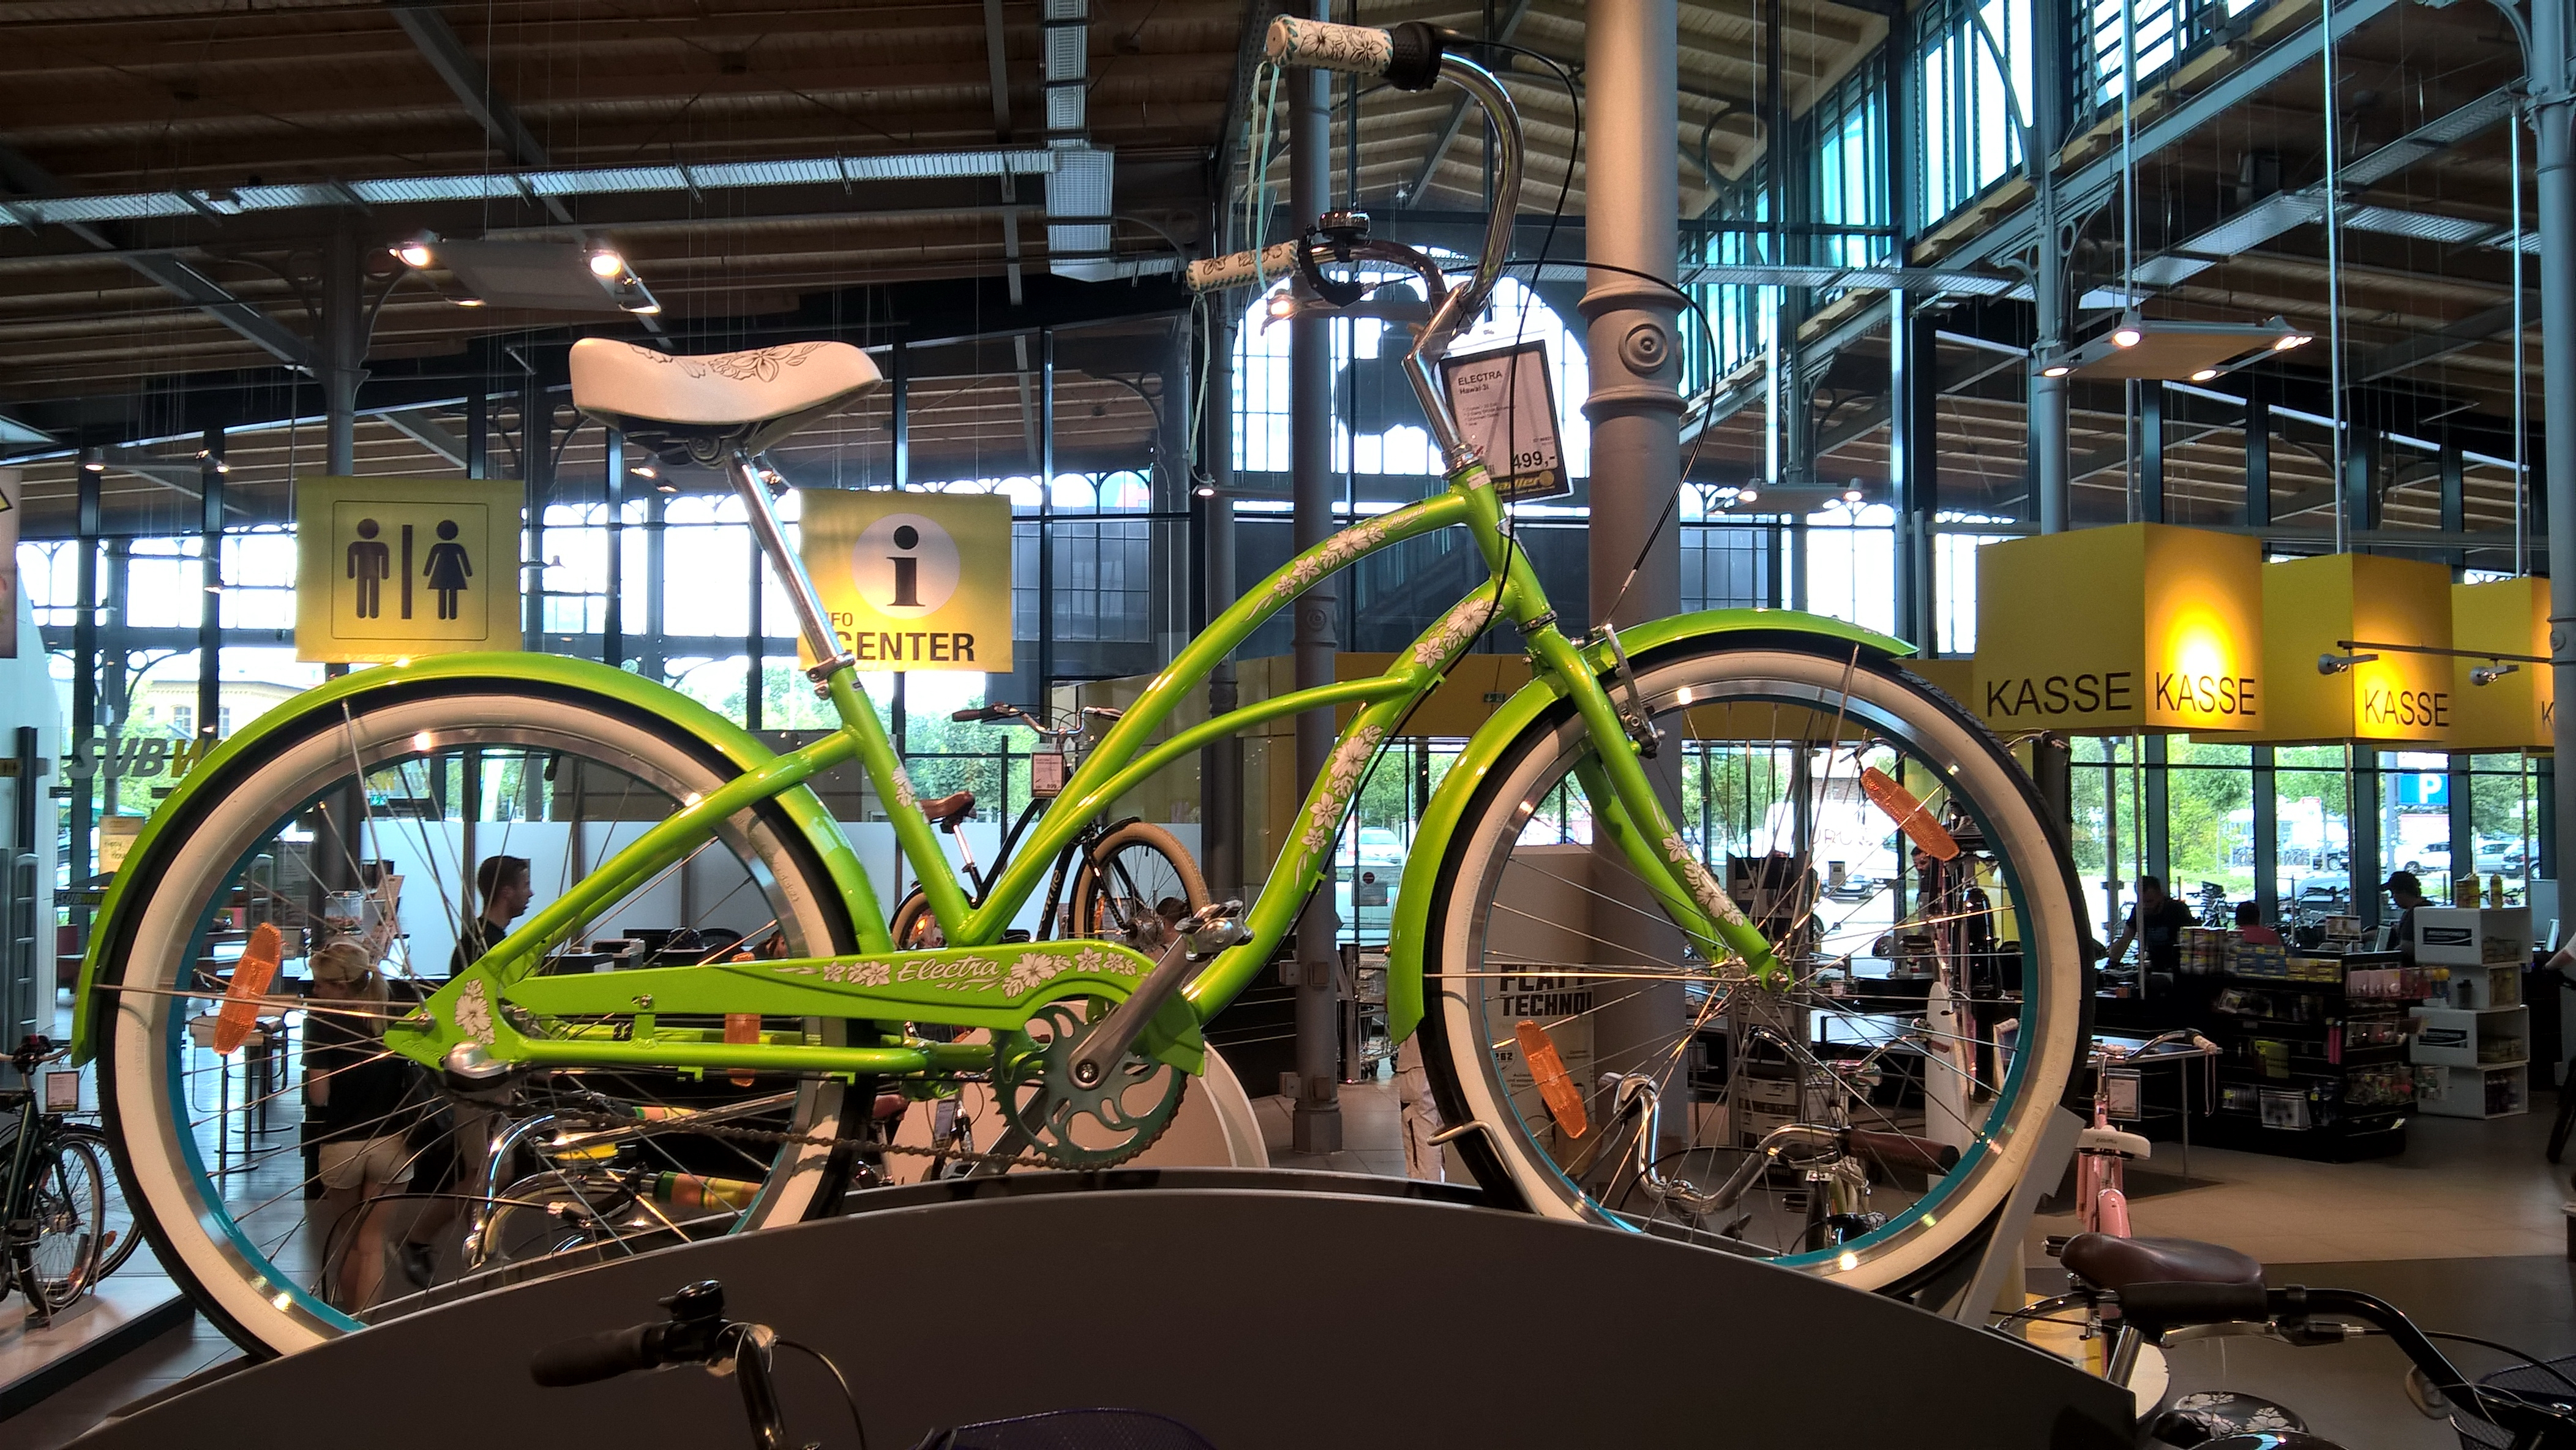 16-07-20-Electra-Bike-WP 20160711 14 46 49 Pro.jpg